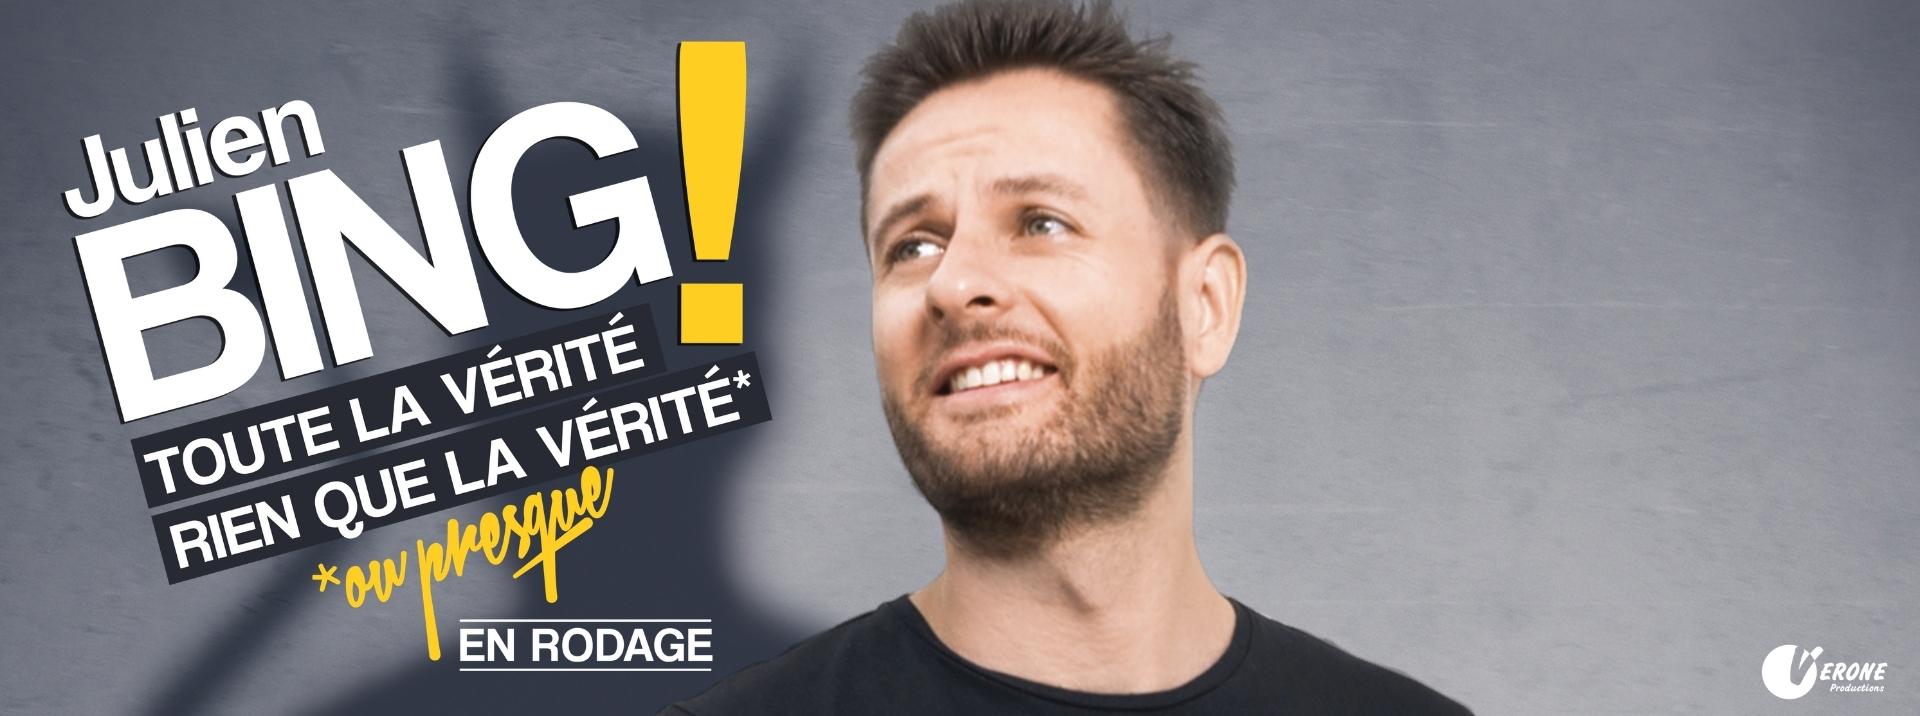 Rire, Humour, One man show, Spectacle, Humoriste, Nantes, Compagnie, Théâtre